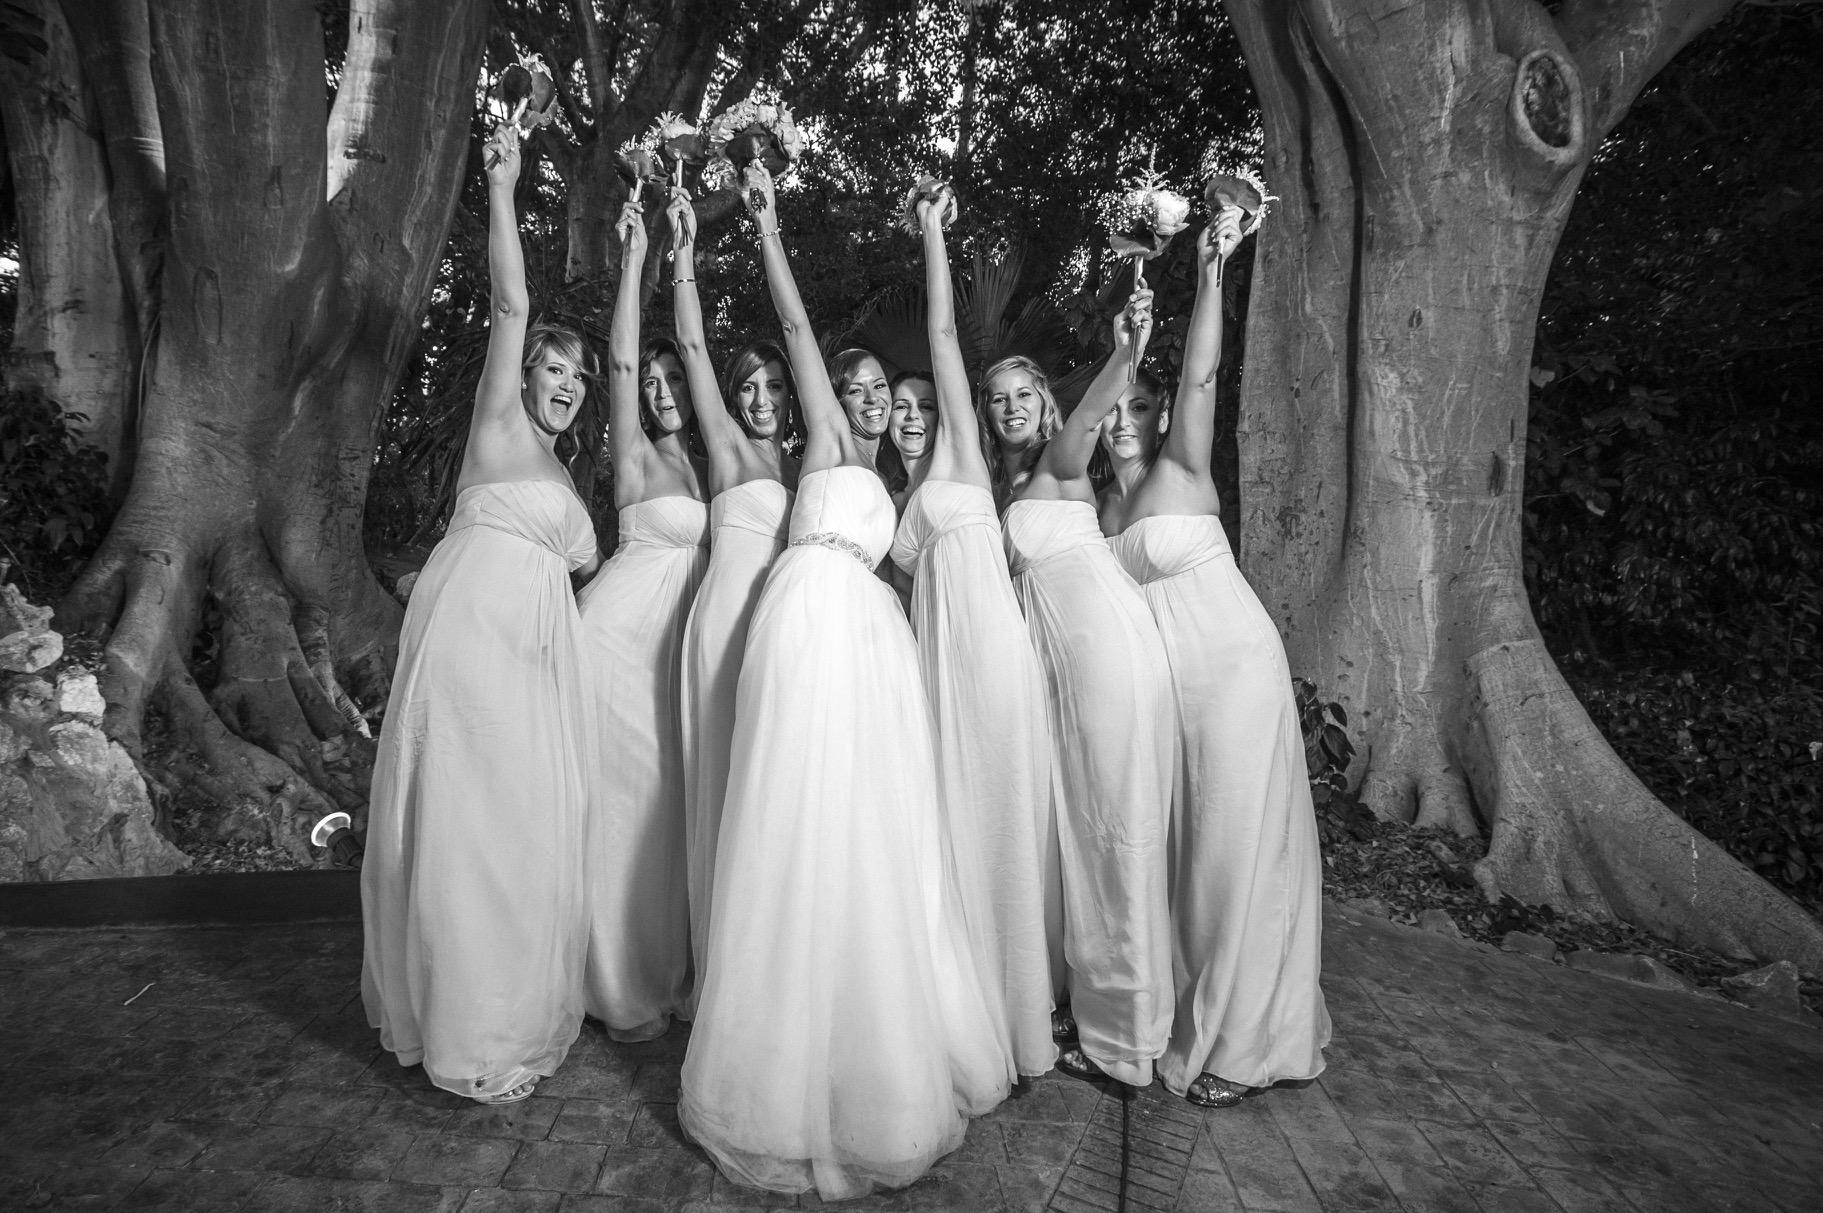 Si-Quiero-Wedding-Planner-By-Sira-Antequera-Virginia-Jose-21